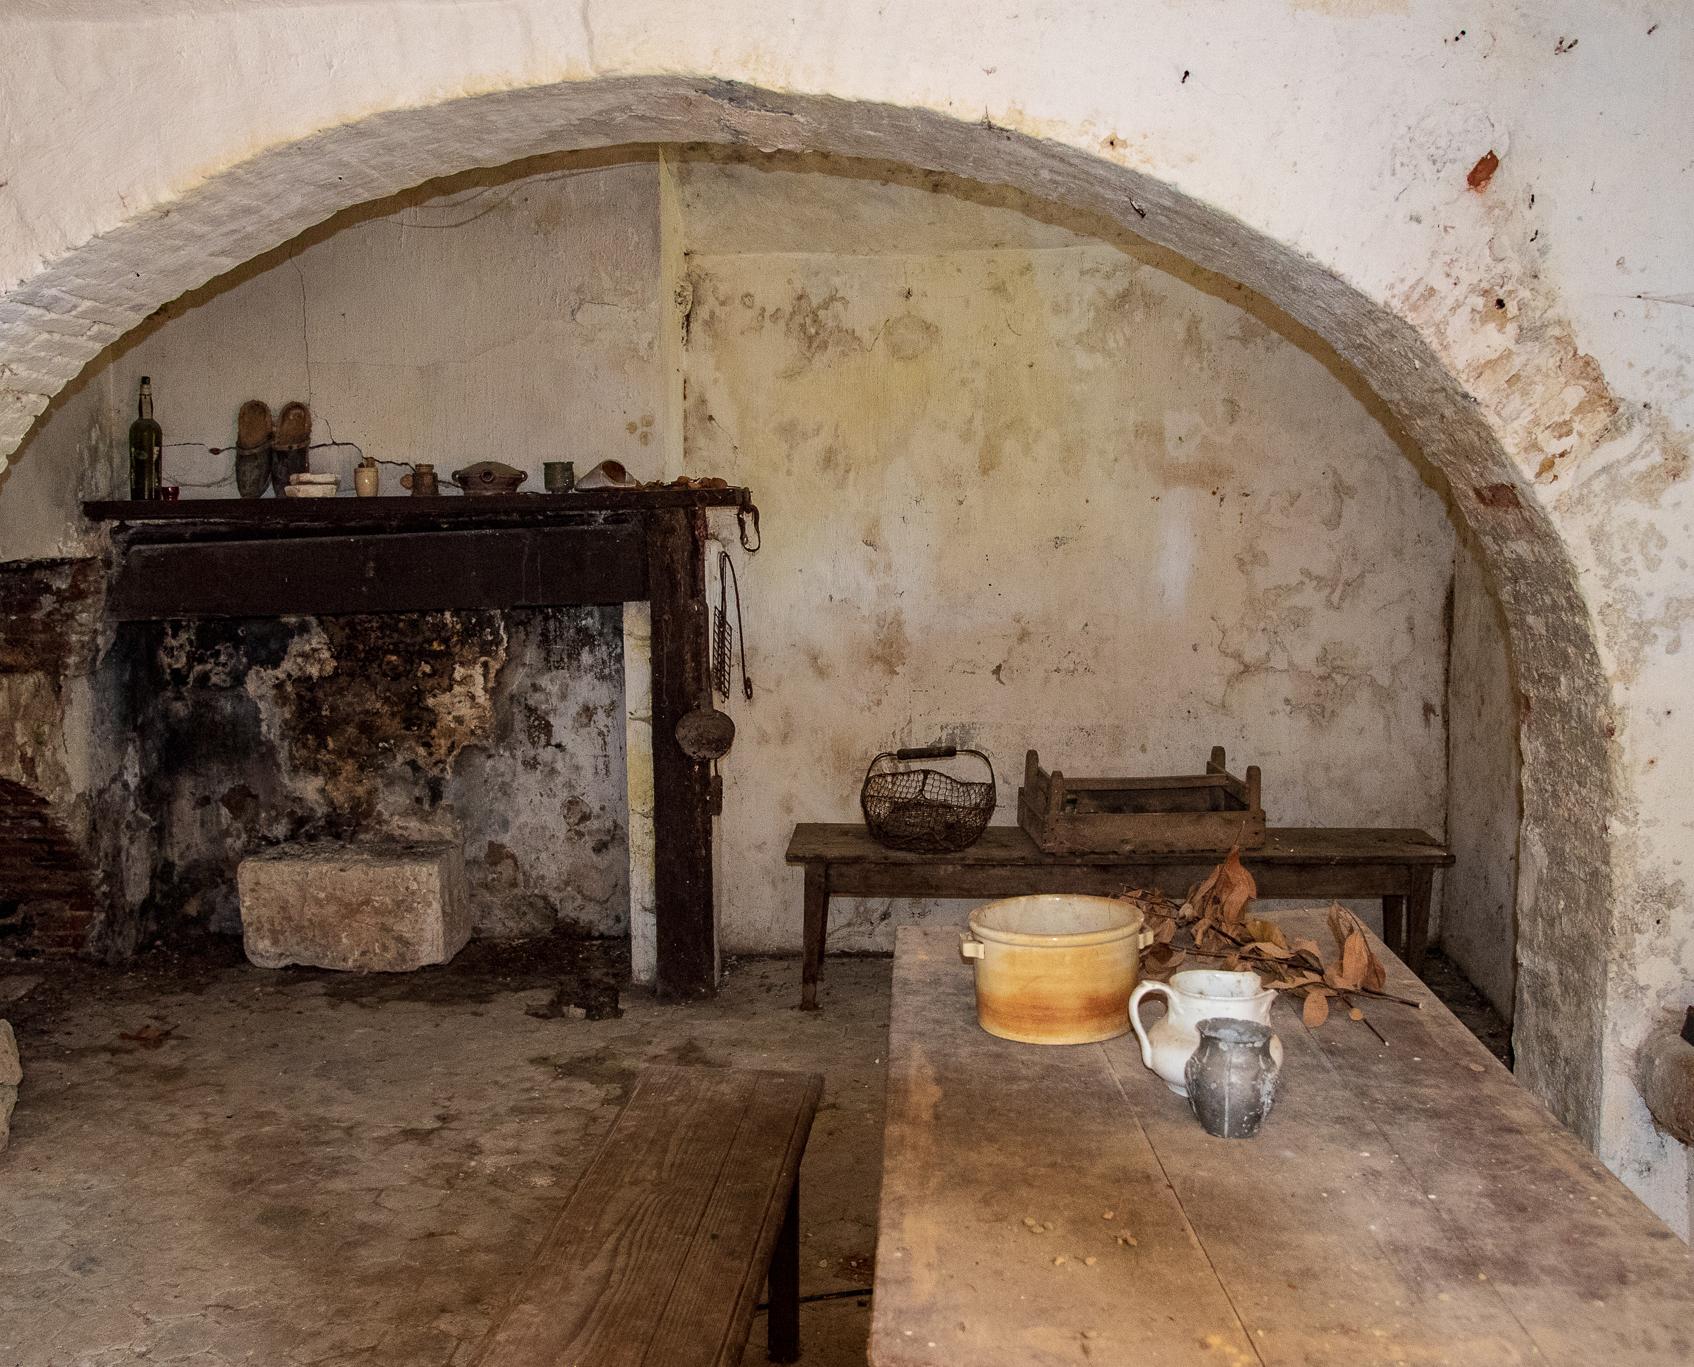 Laon Maison de vigneron Le Nain kelder